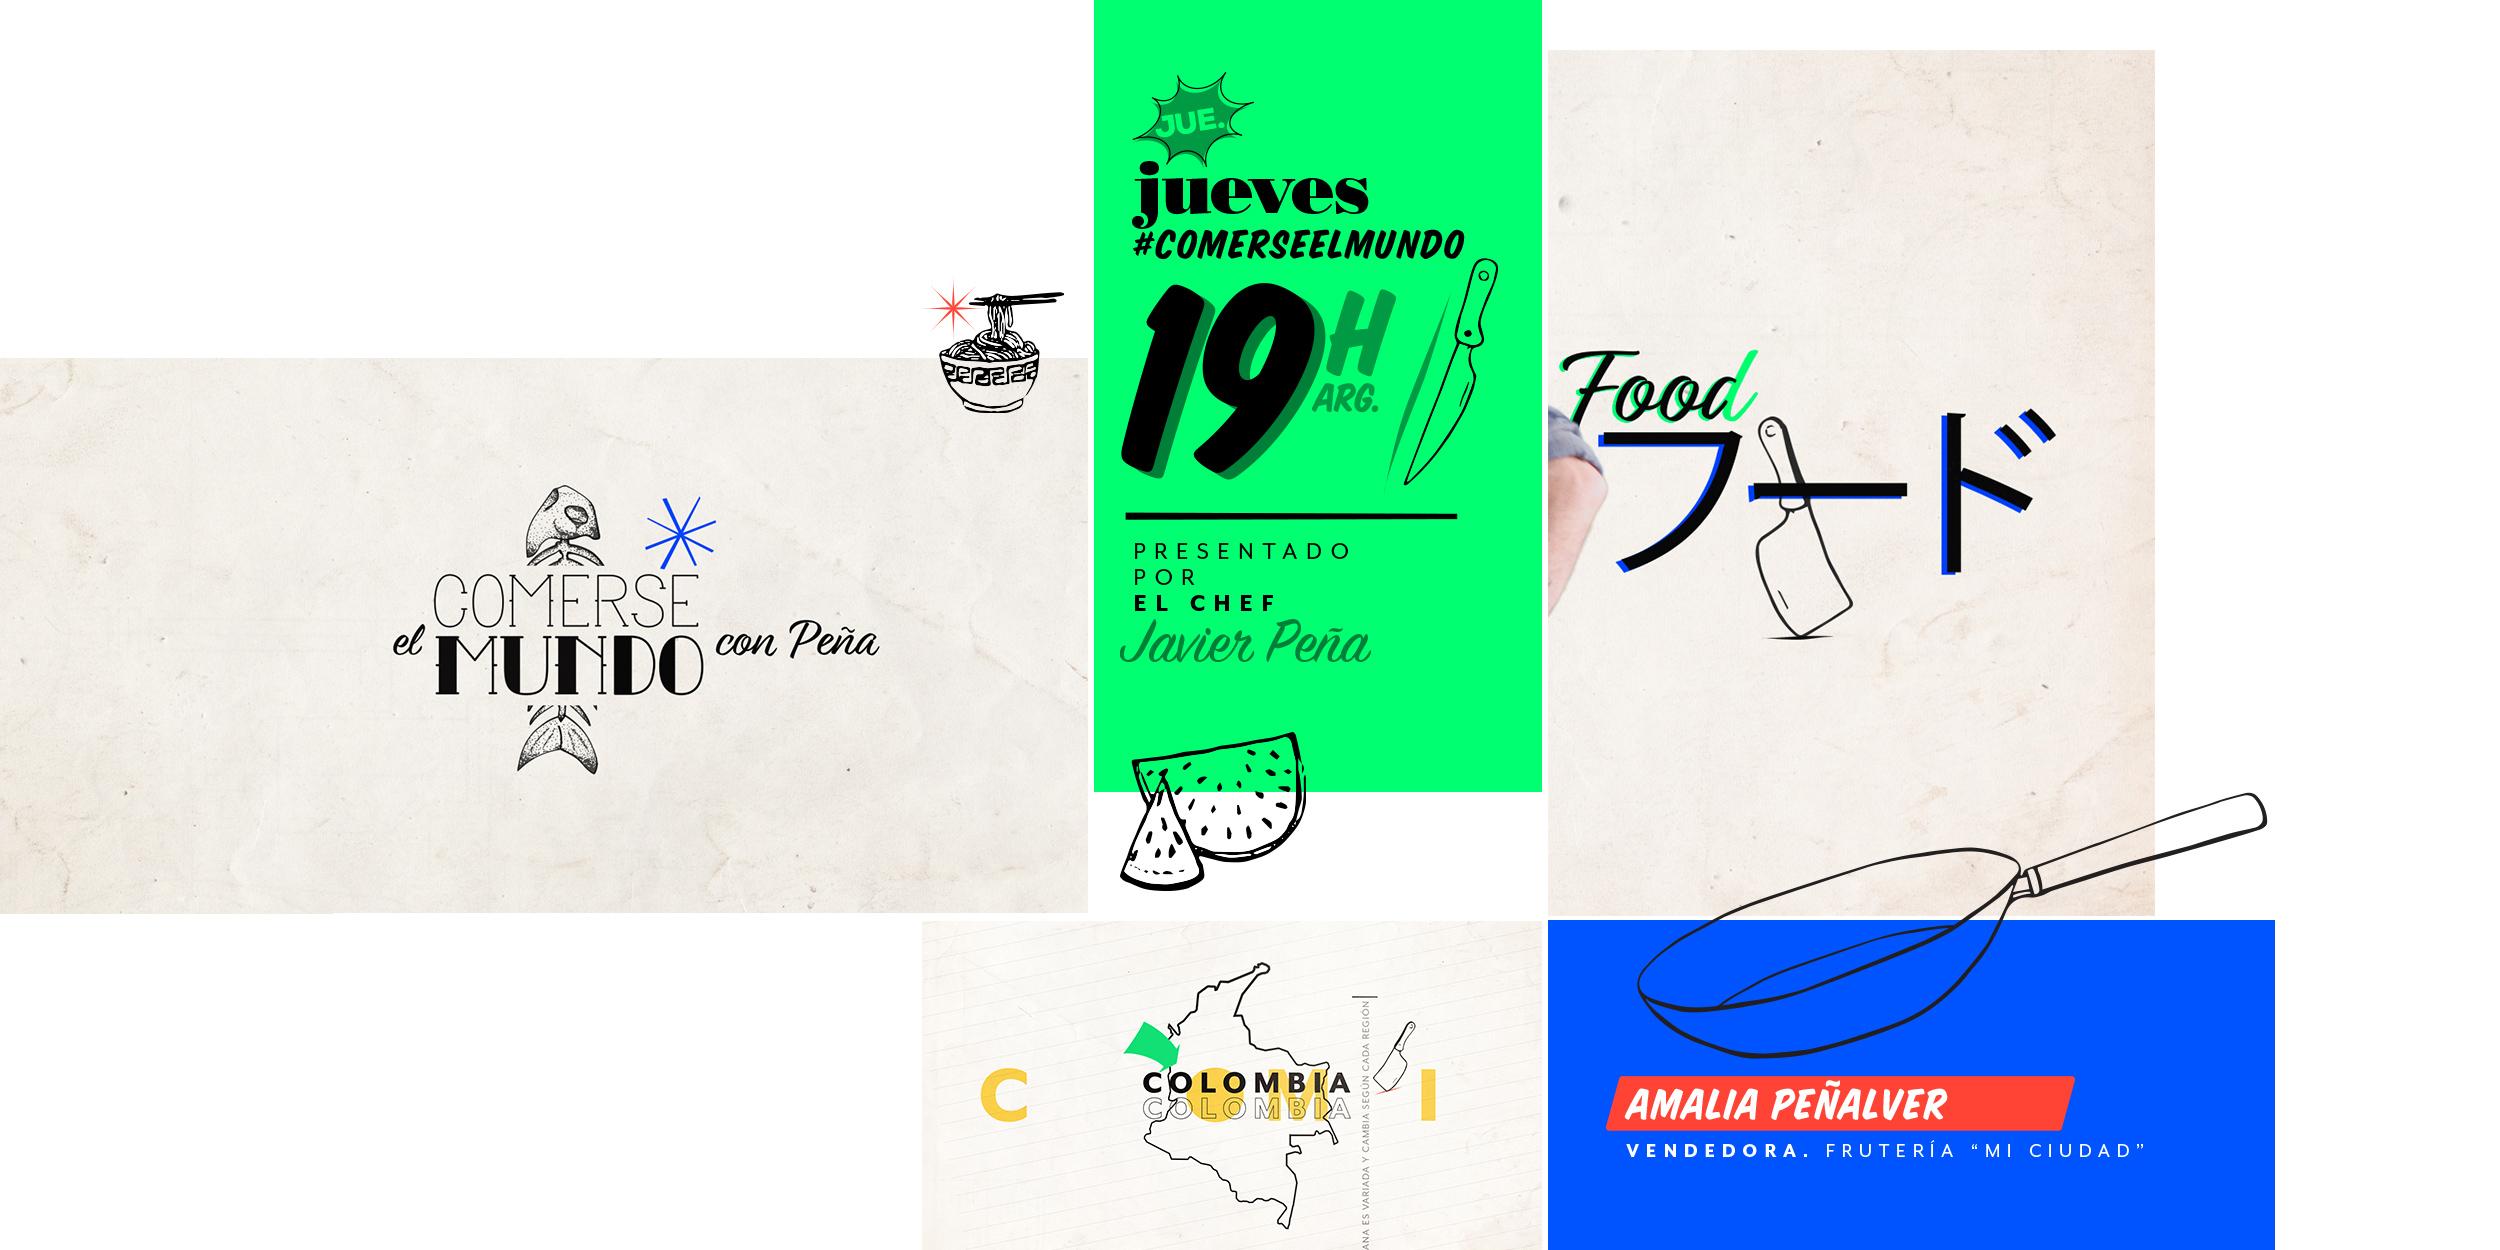 CEM_Post_Gallery_2x1_Collage_v02_Comp_02.jpg